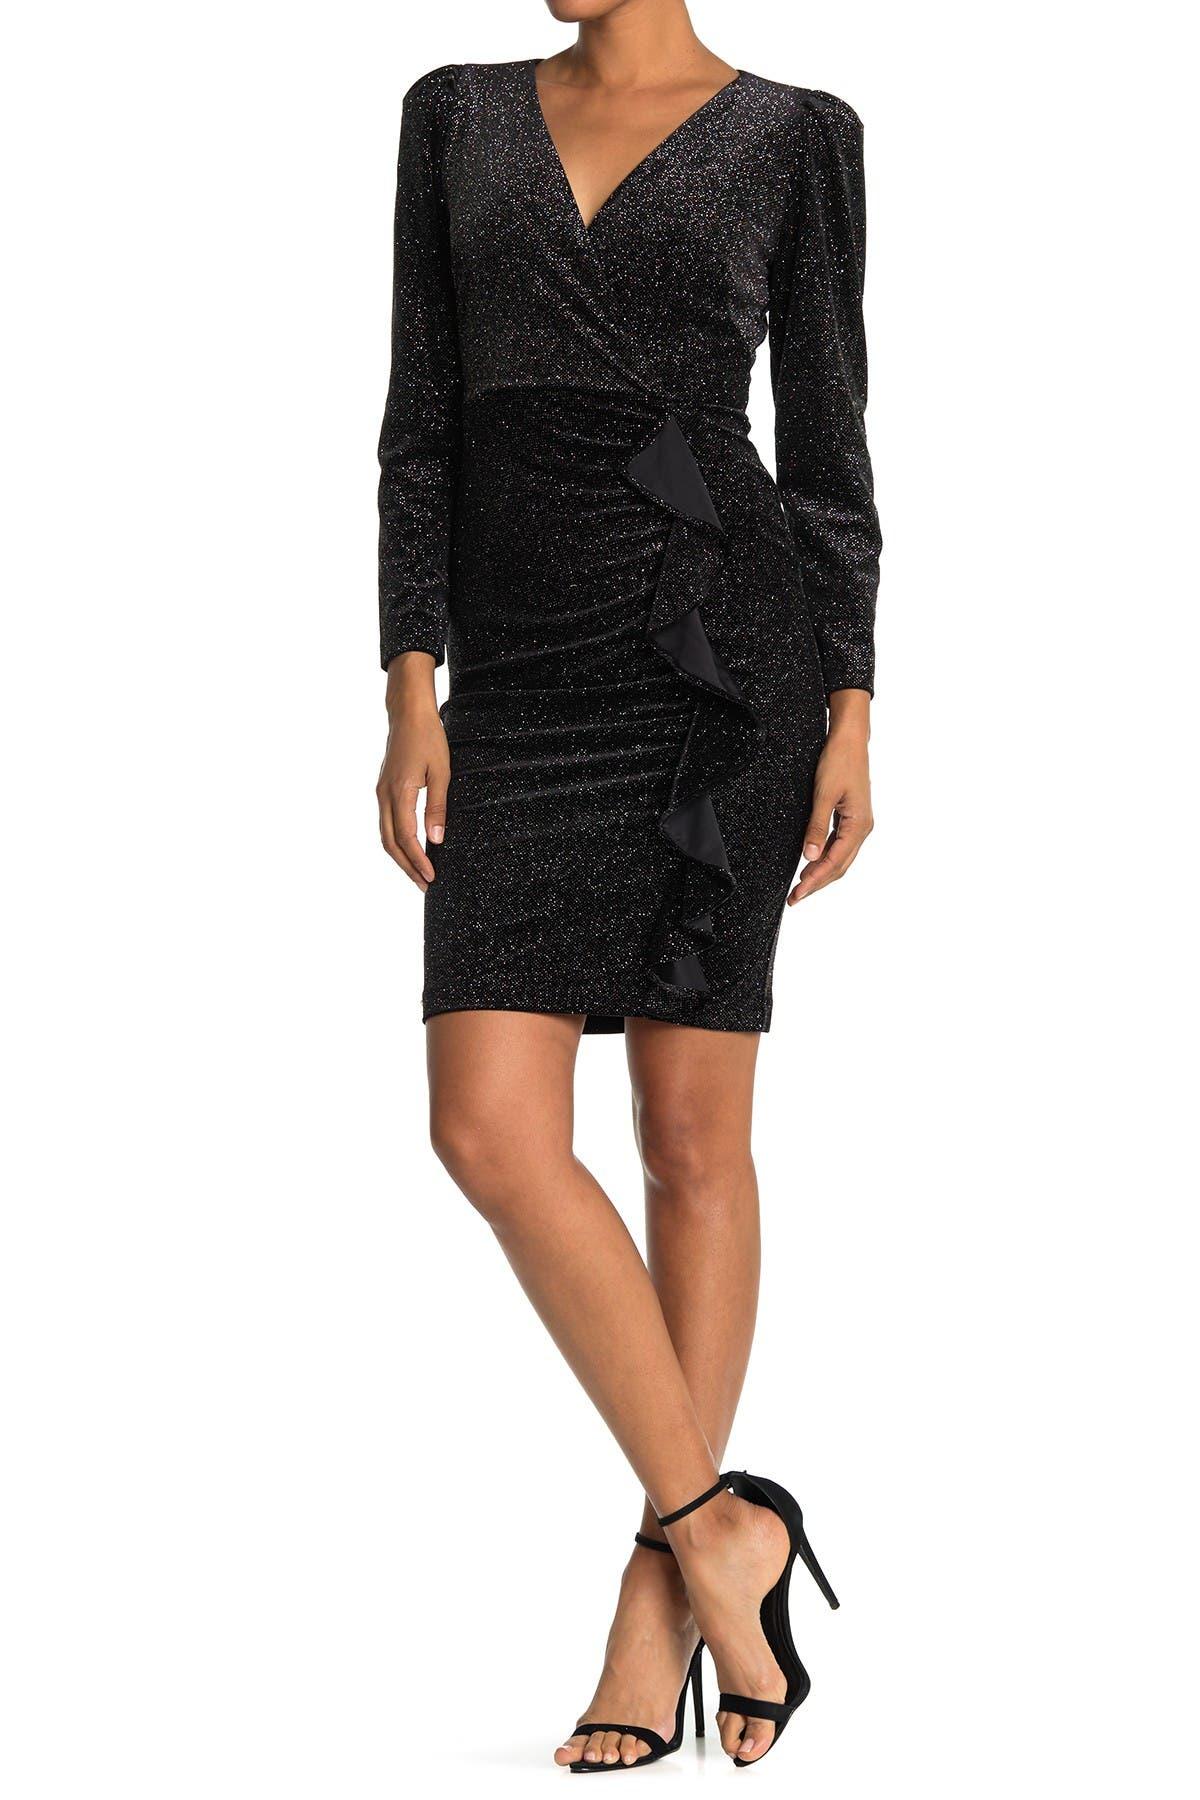 Image of Calvin Klein Sparkle Velvet Side Ruched Dress